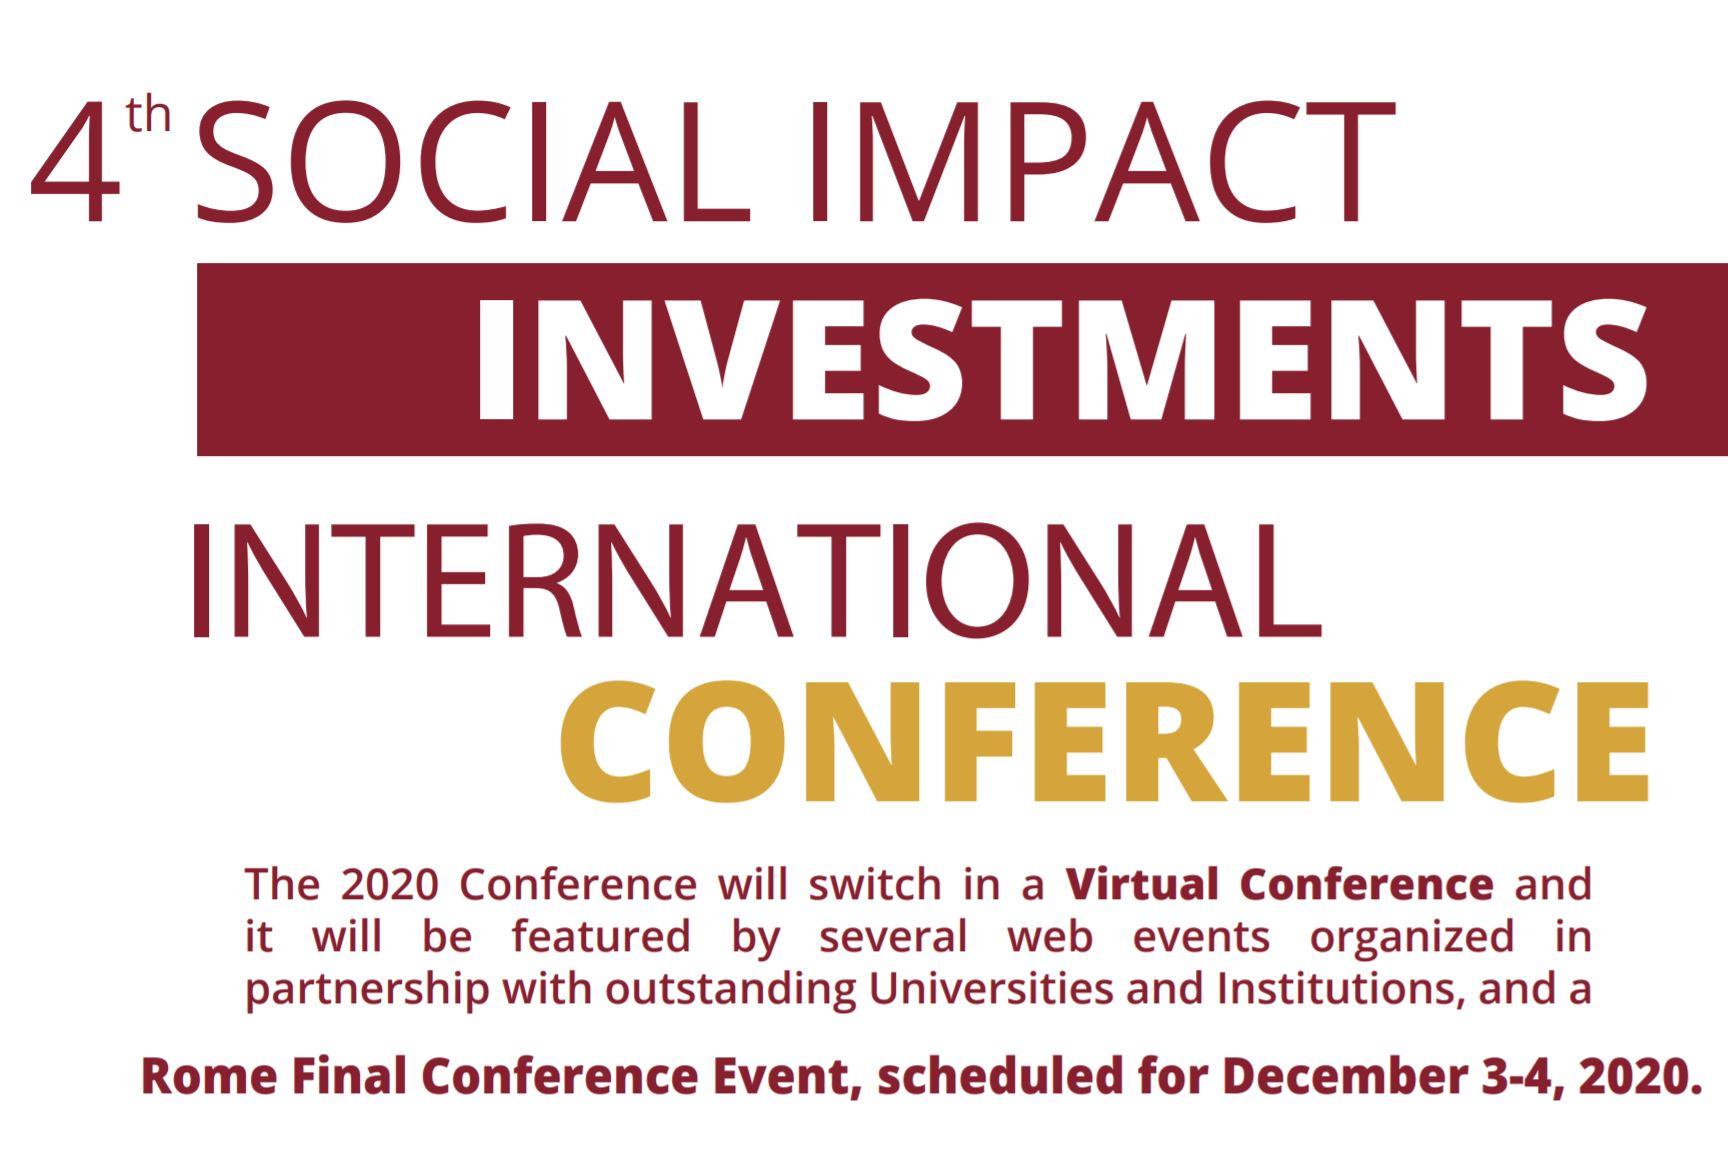 social-impact-investments_la-torre-1